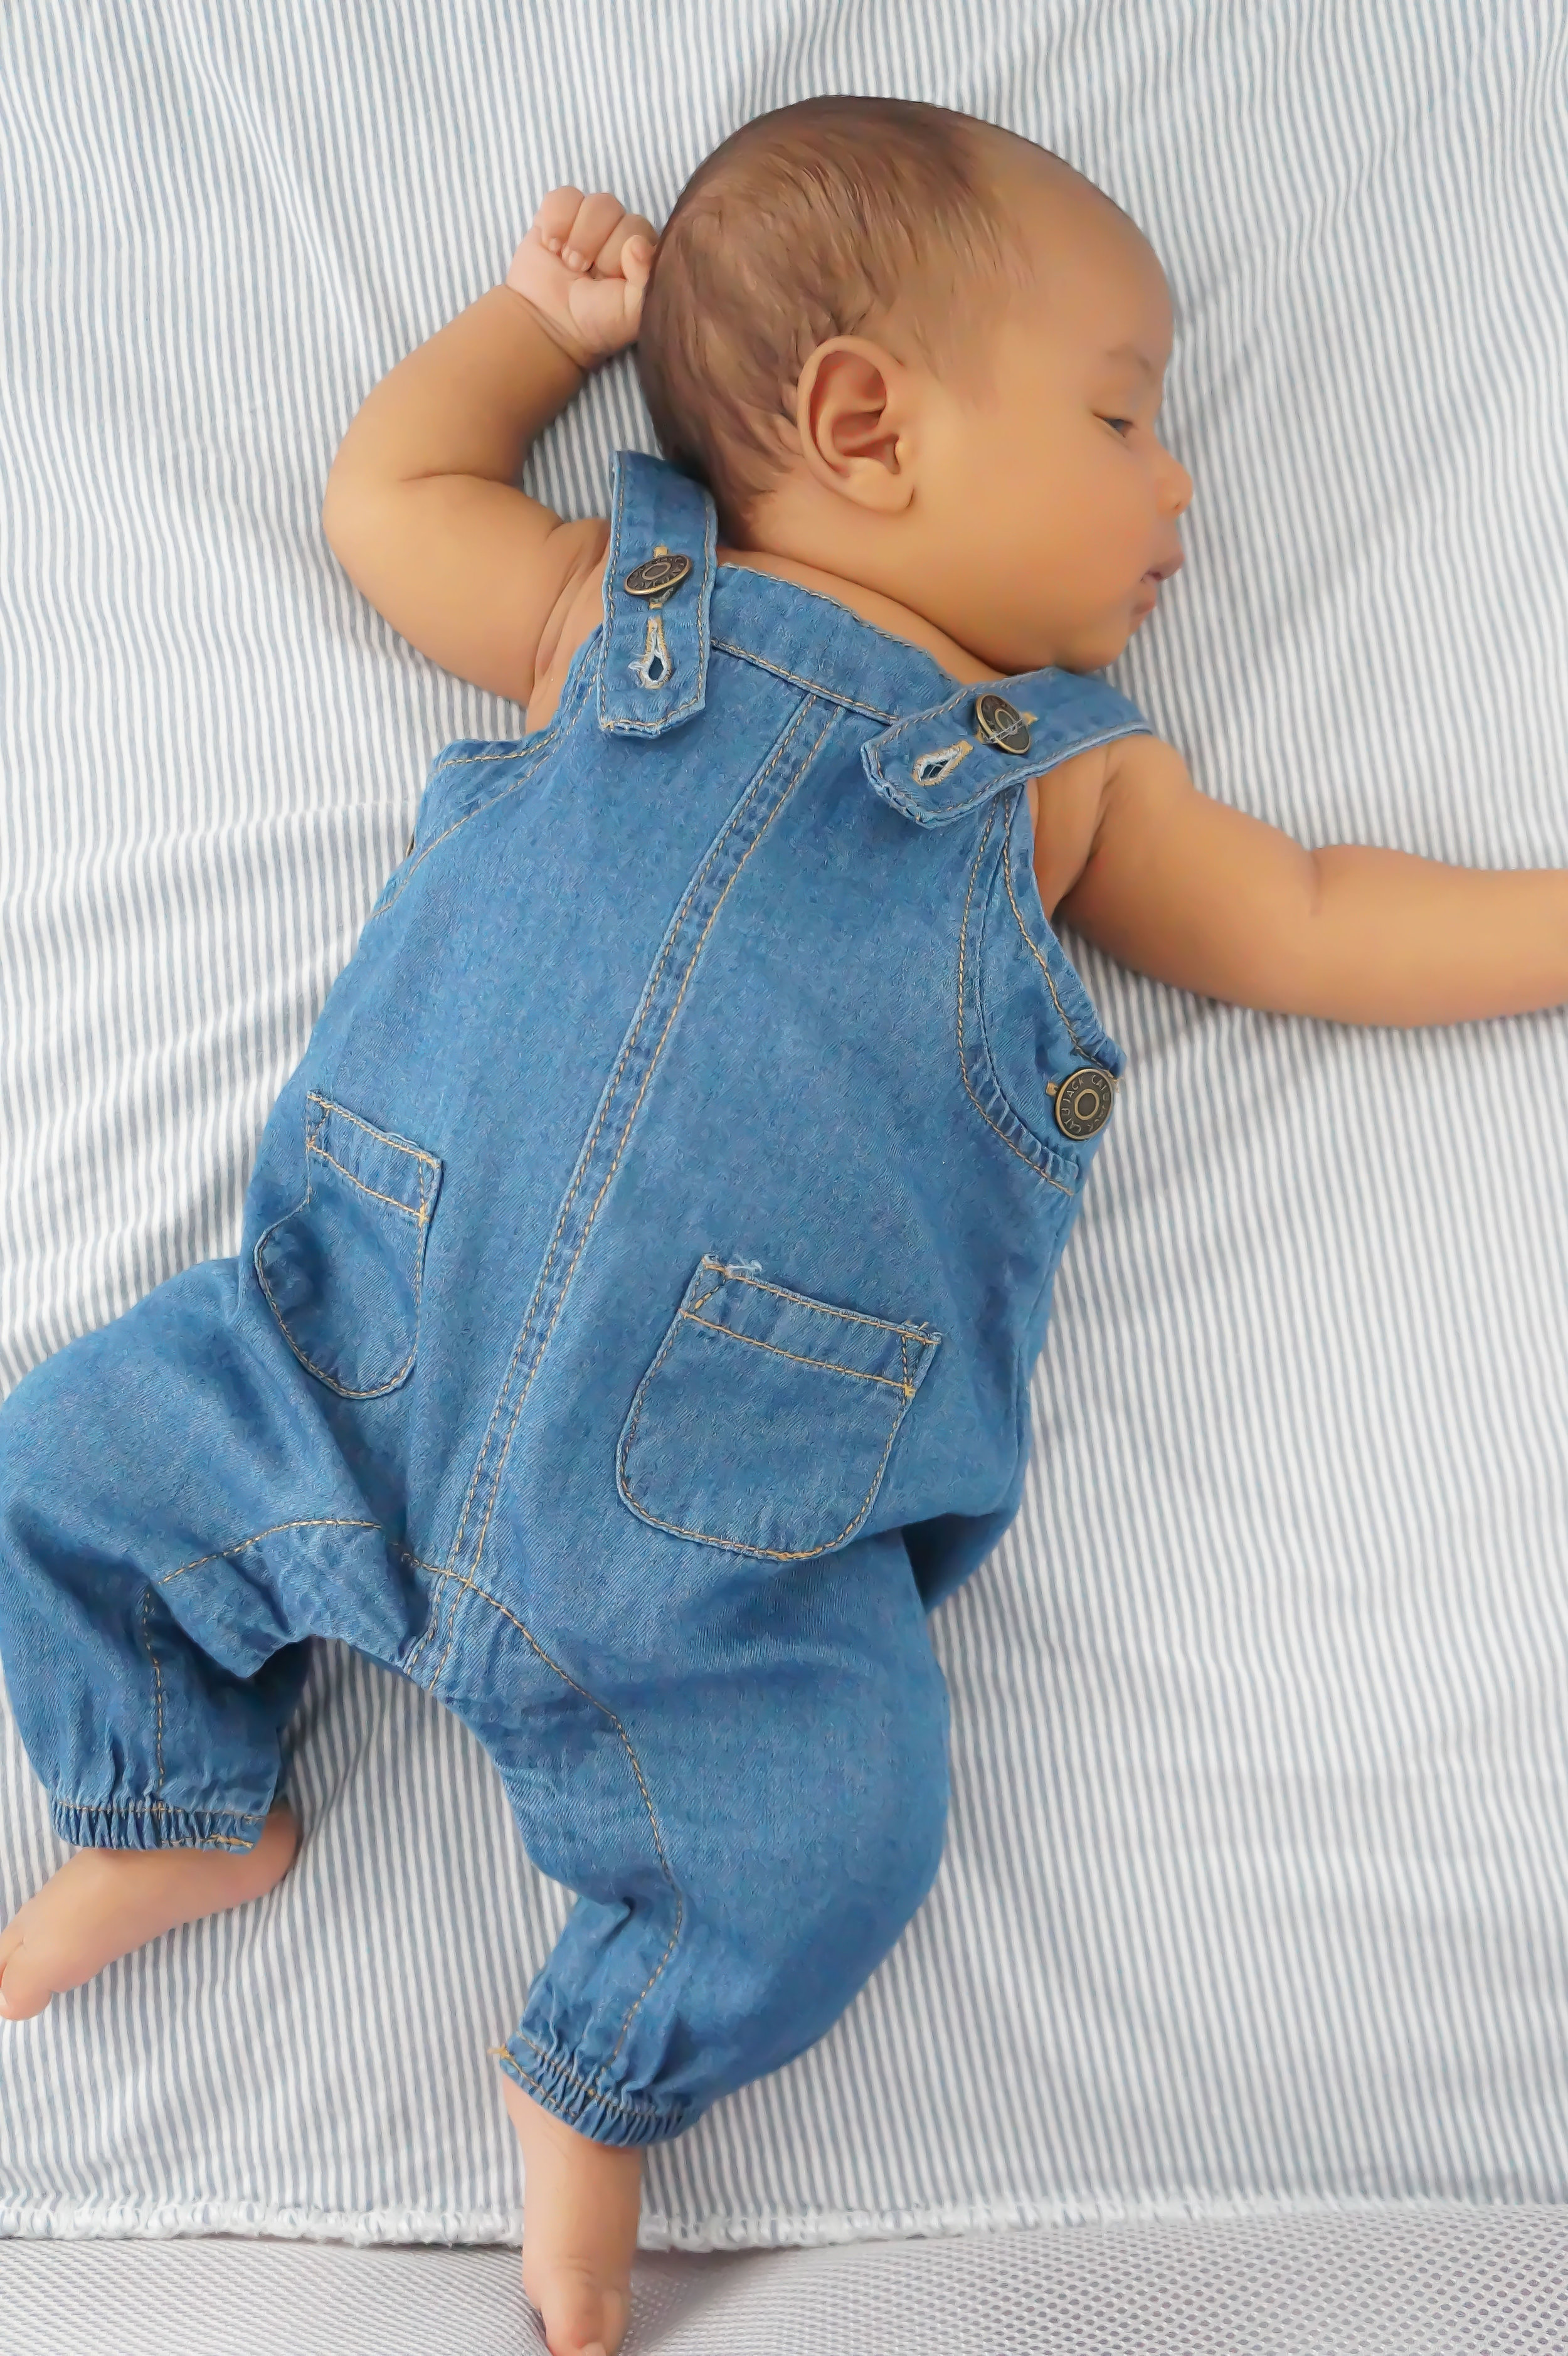 Andrea Fenise Memphis Fashion Blogger shares newborn pictures